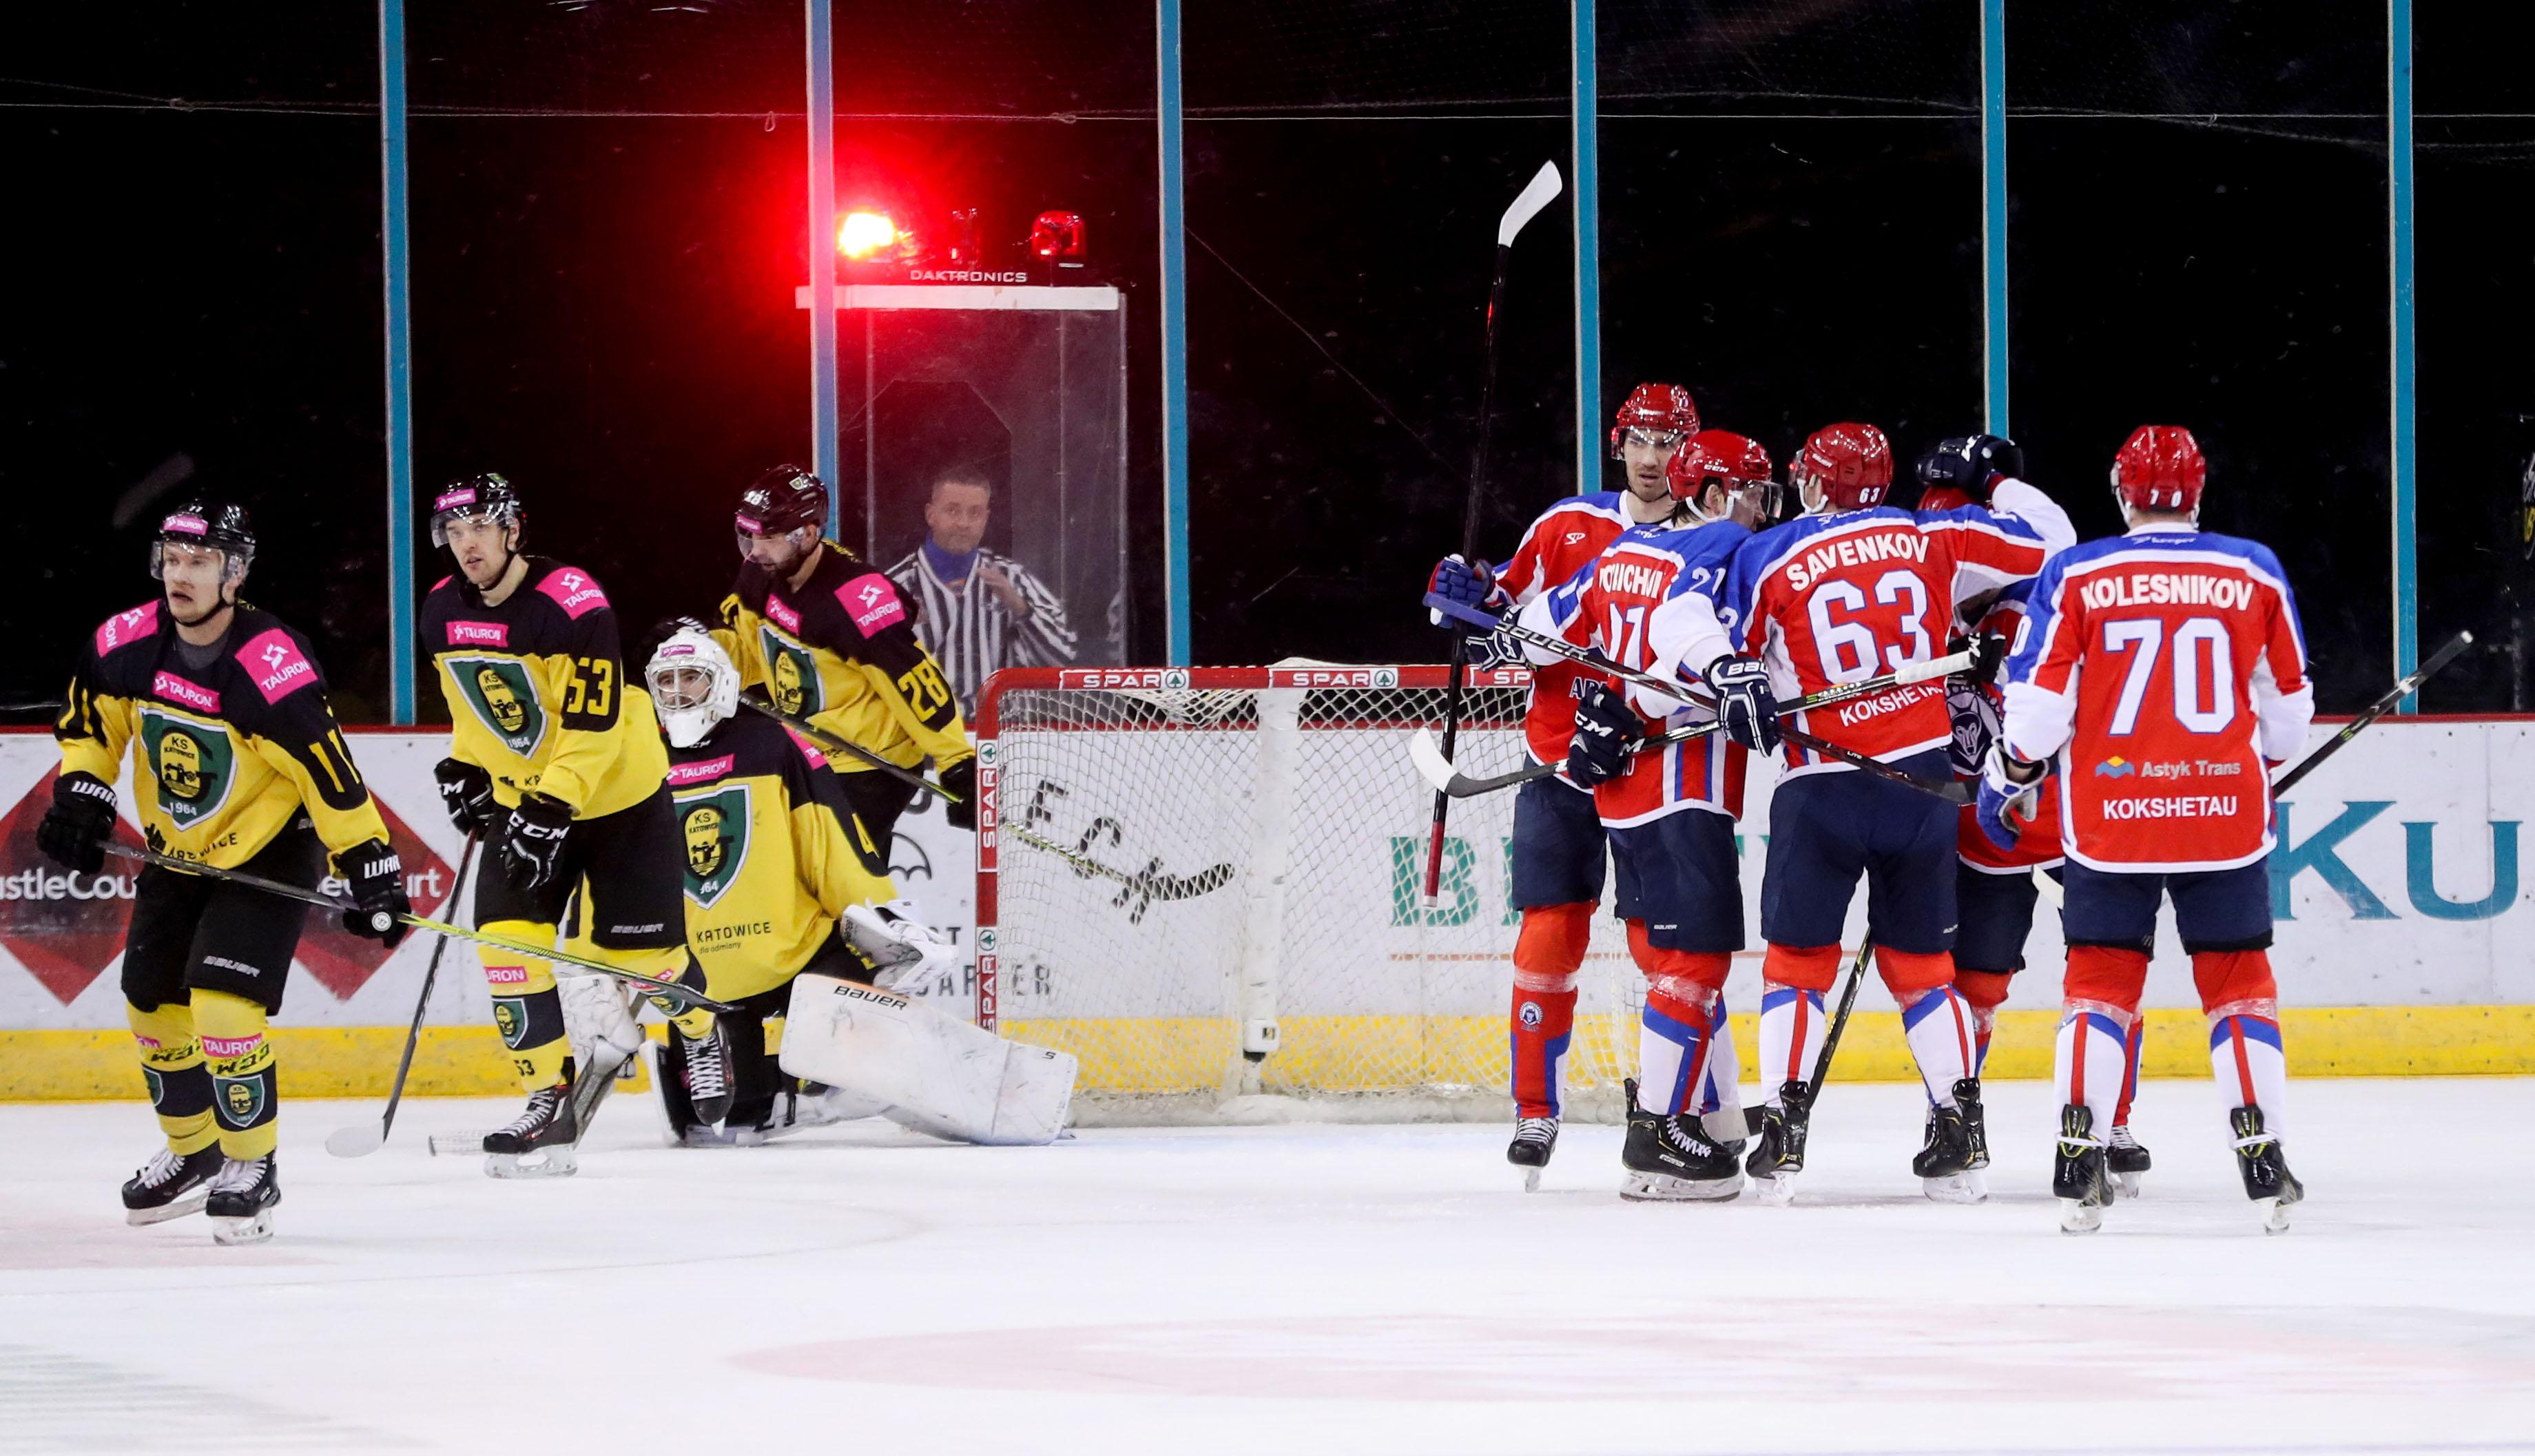 Continental Cup Final - GKS Katowice vs Arlan Kokshetau